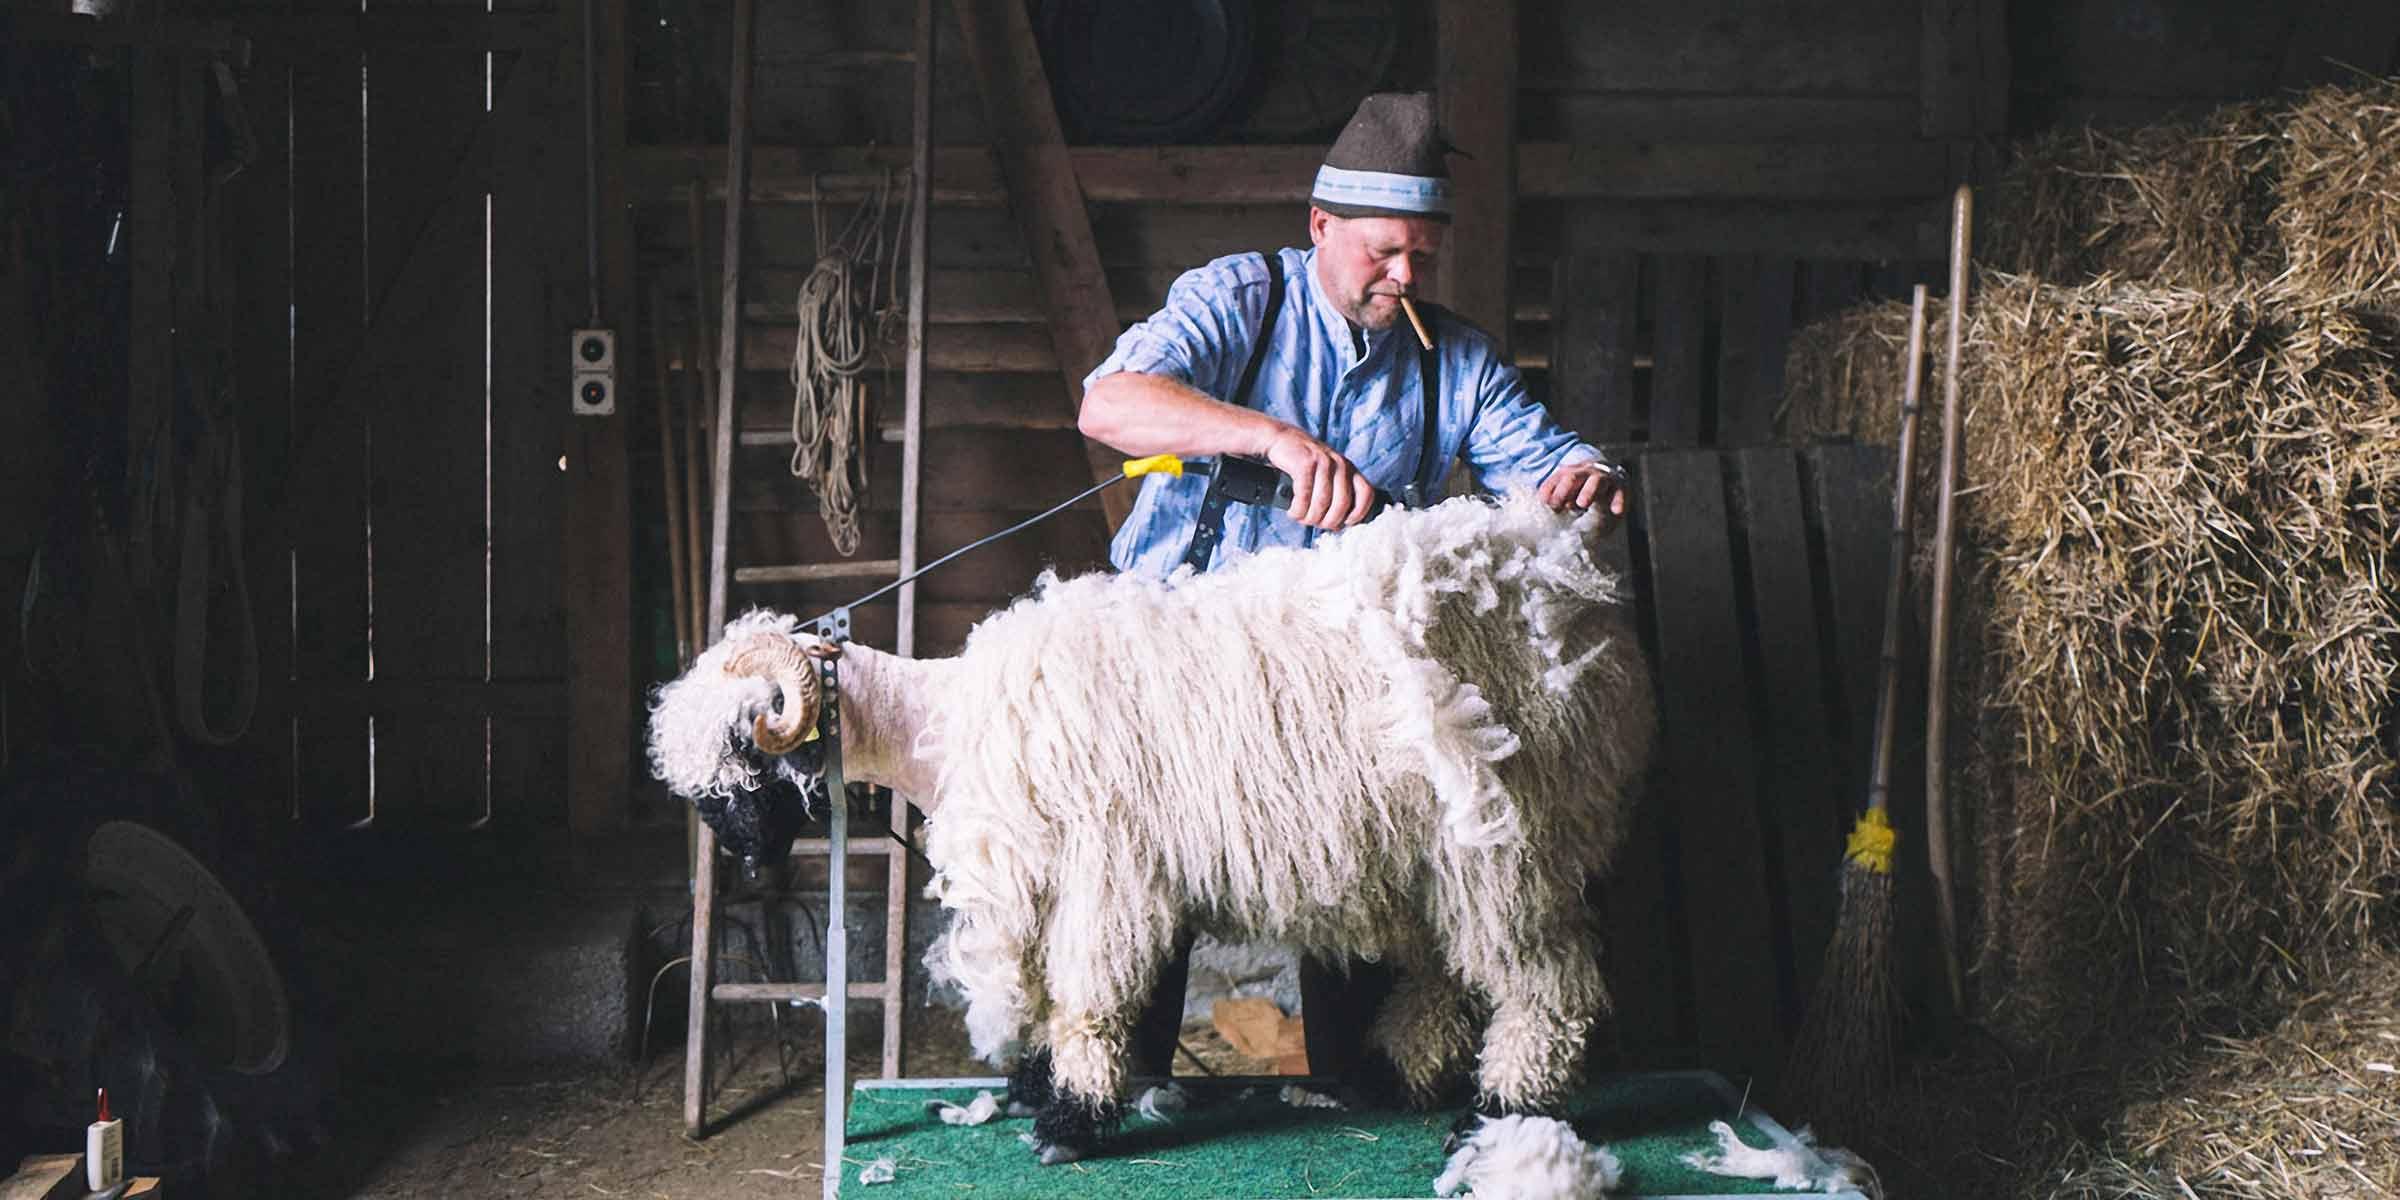 Swisswool Schafschur Hand mit Schermesser am Rücken des Schafs